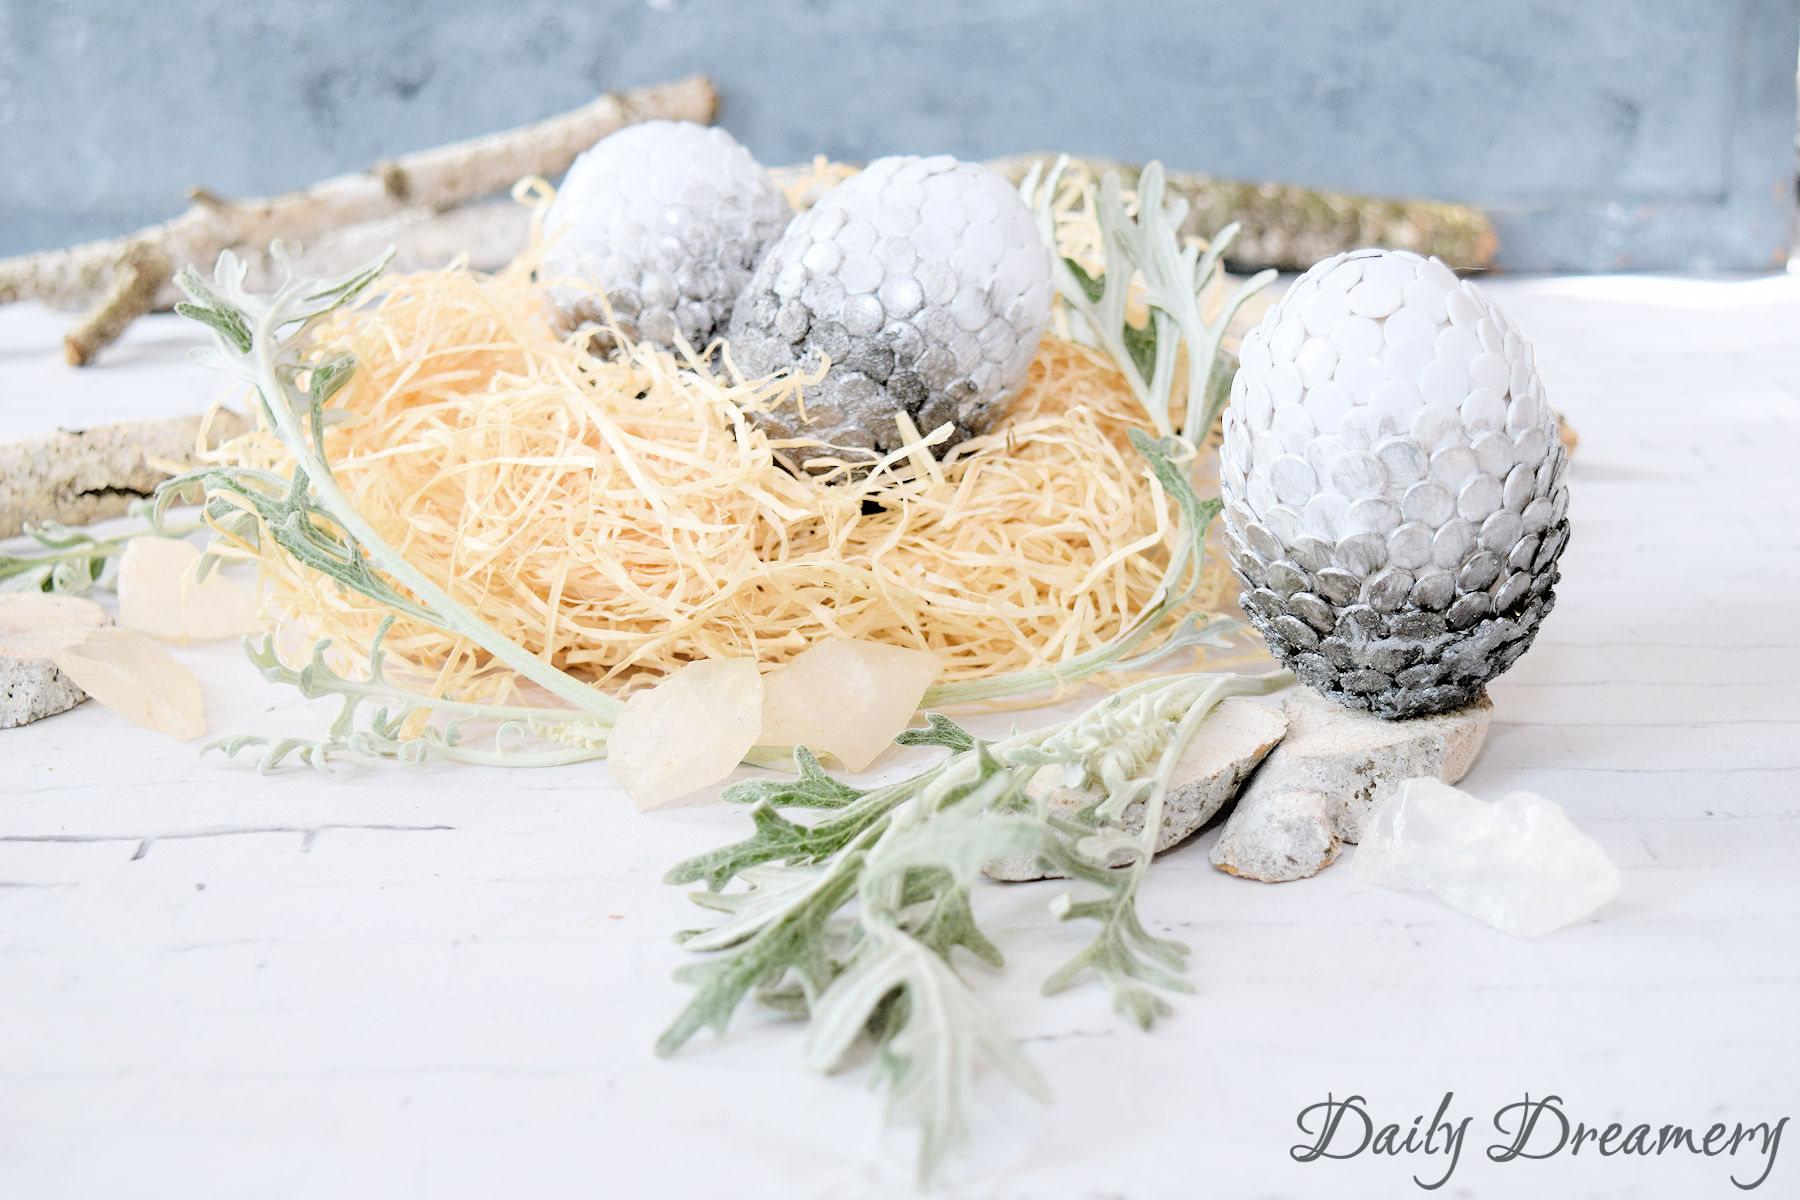 Osterdeko mal anders - Drachen-(Oster)-Eier easy selber machen